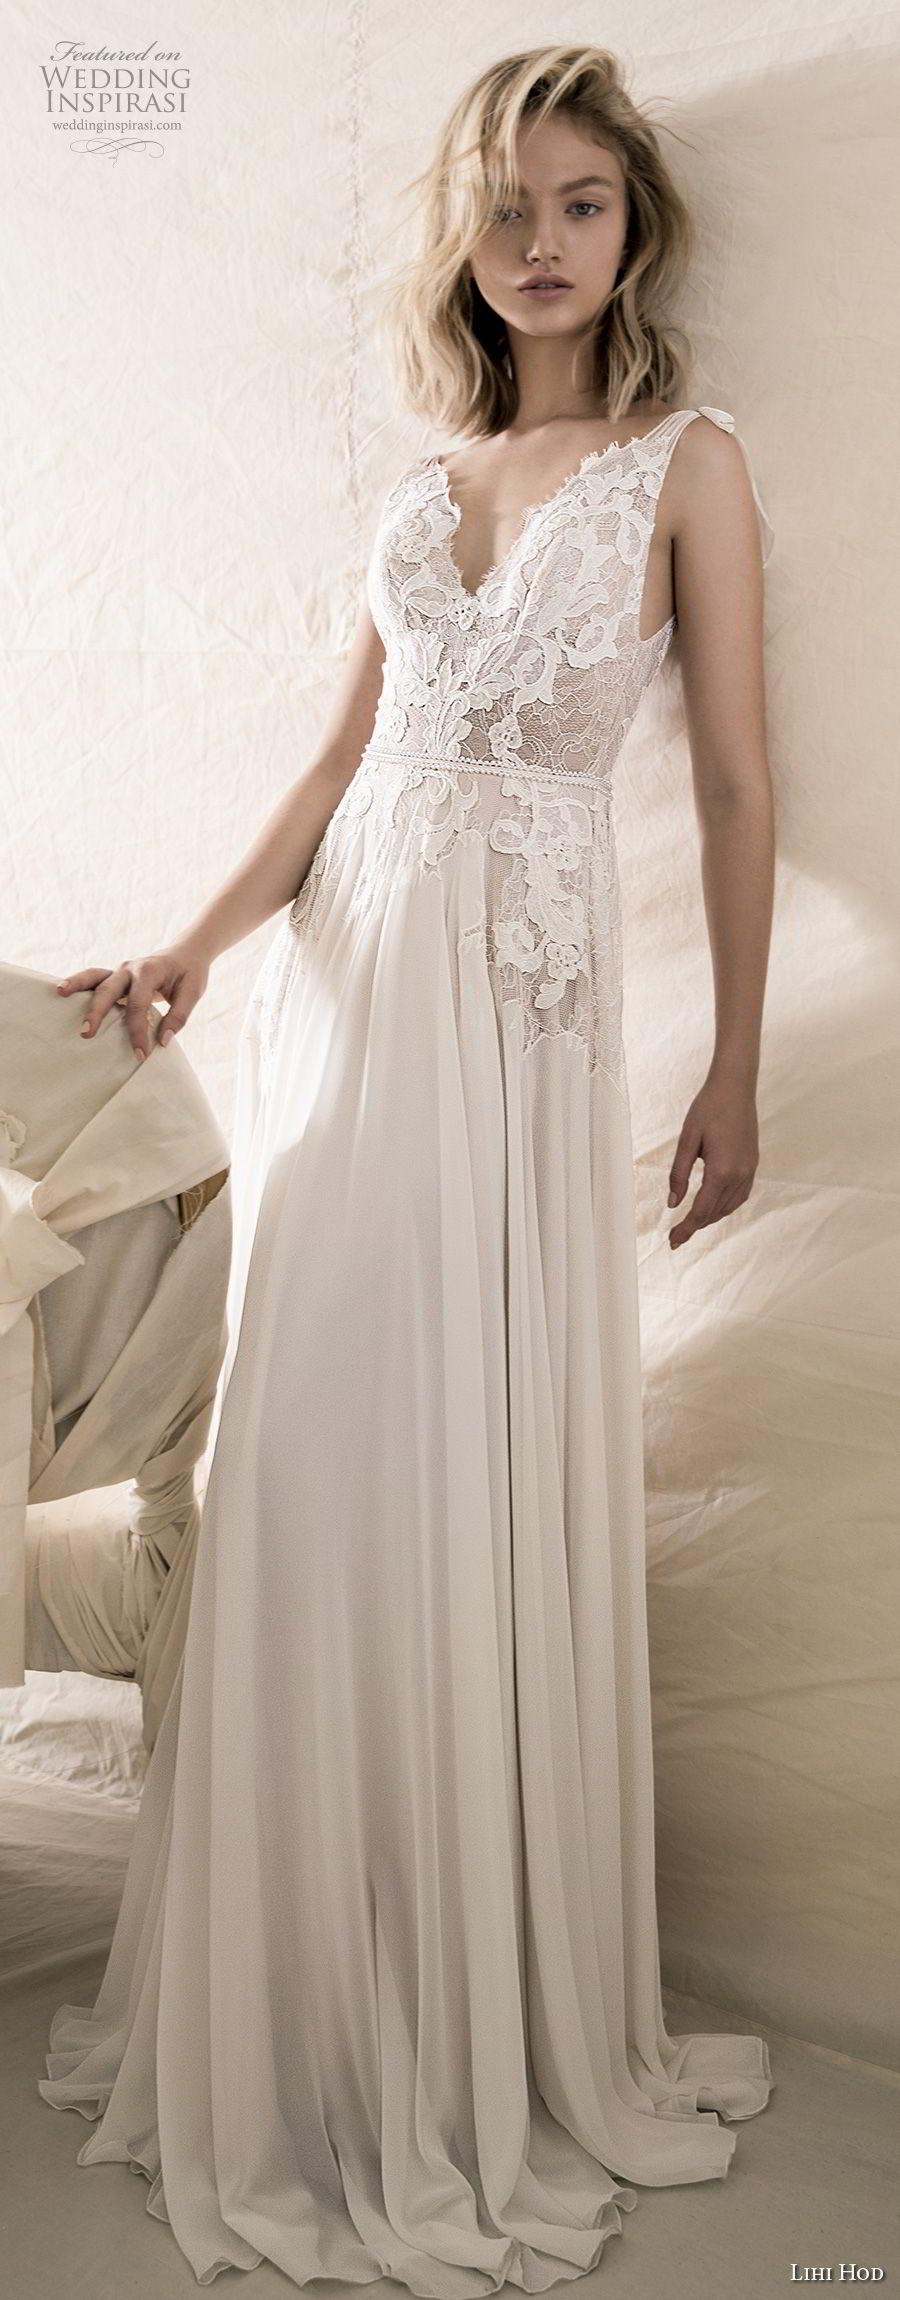 lihi hod 2018 bridal sleeveless v neck heavily embellished bodice romantic soft a  line wedding dress open v back sweep train (4) mv